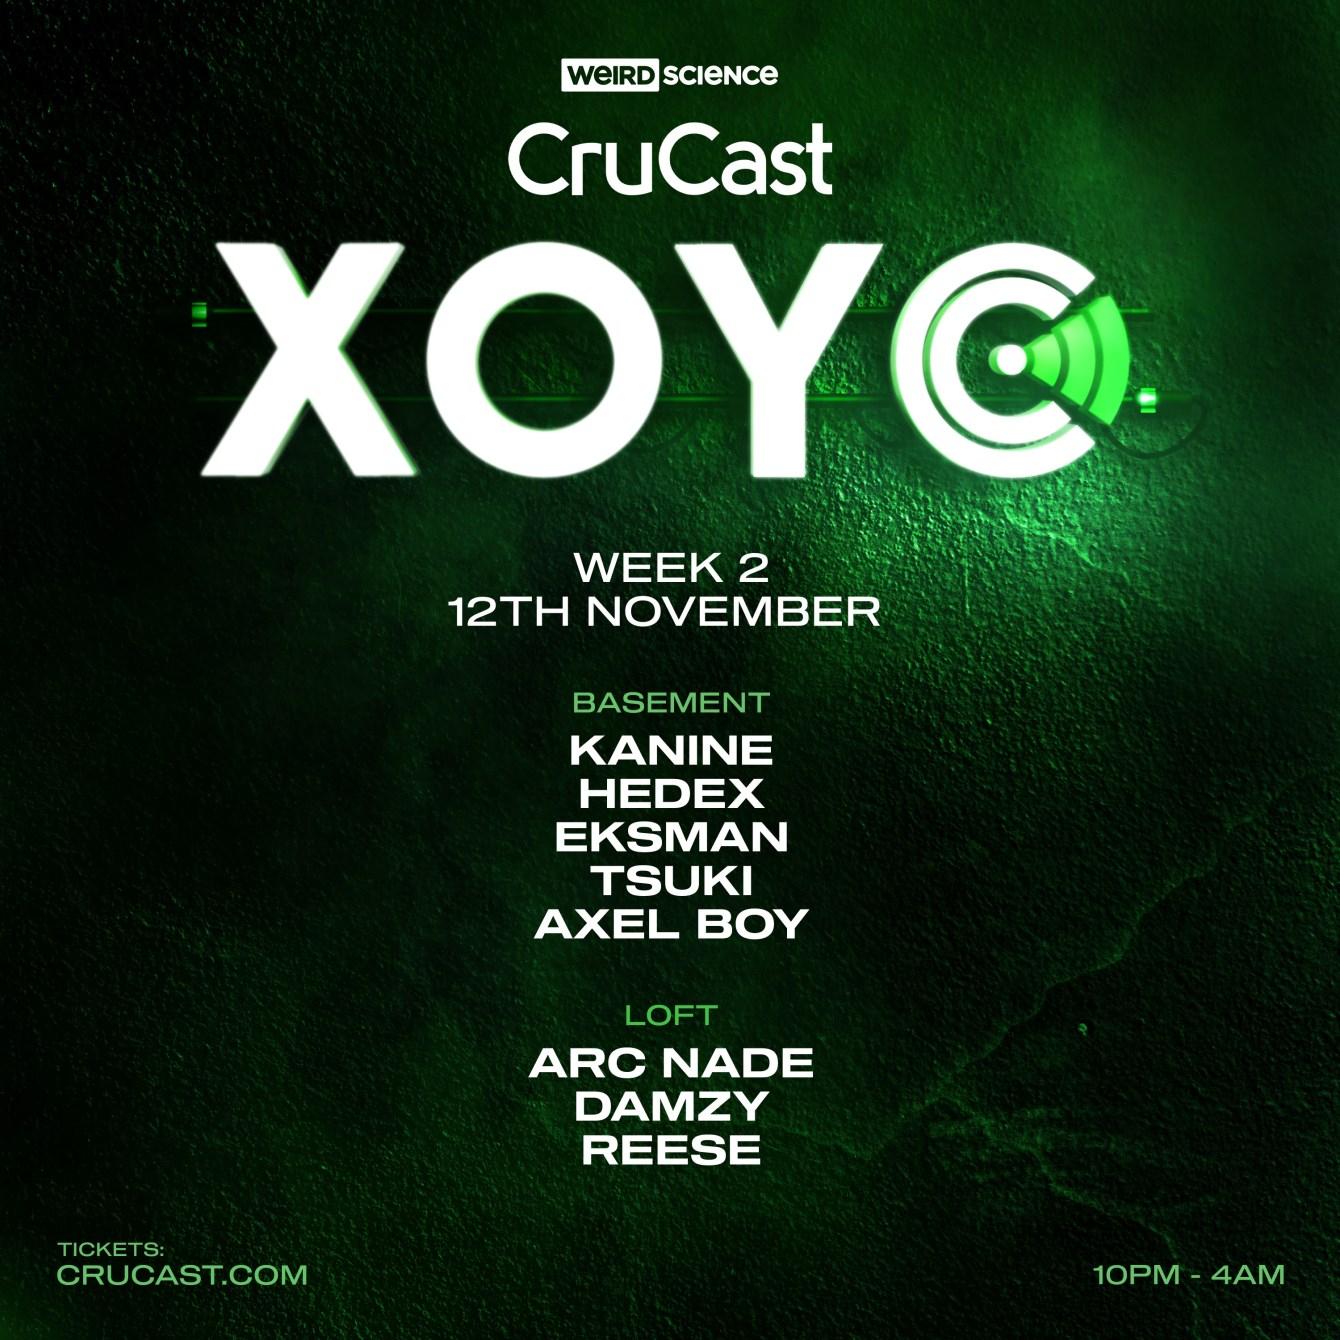 Crucast: Xoyo Residency (Week 2) - Flyer front